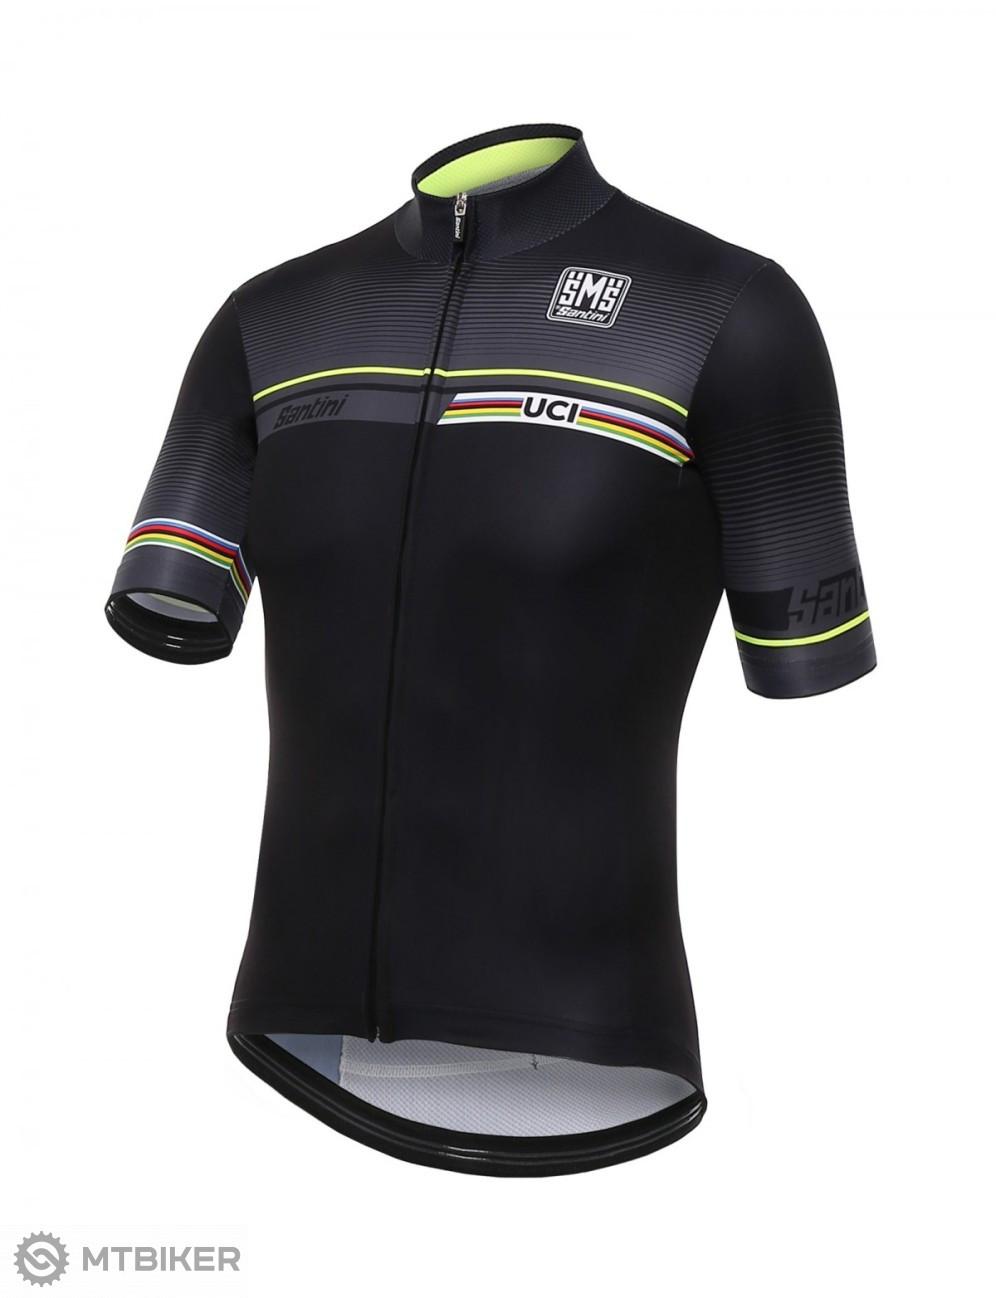 fe4a30c182edc Santini UCI IRIDE S/S originál dres - MTBIKER Shop